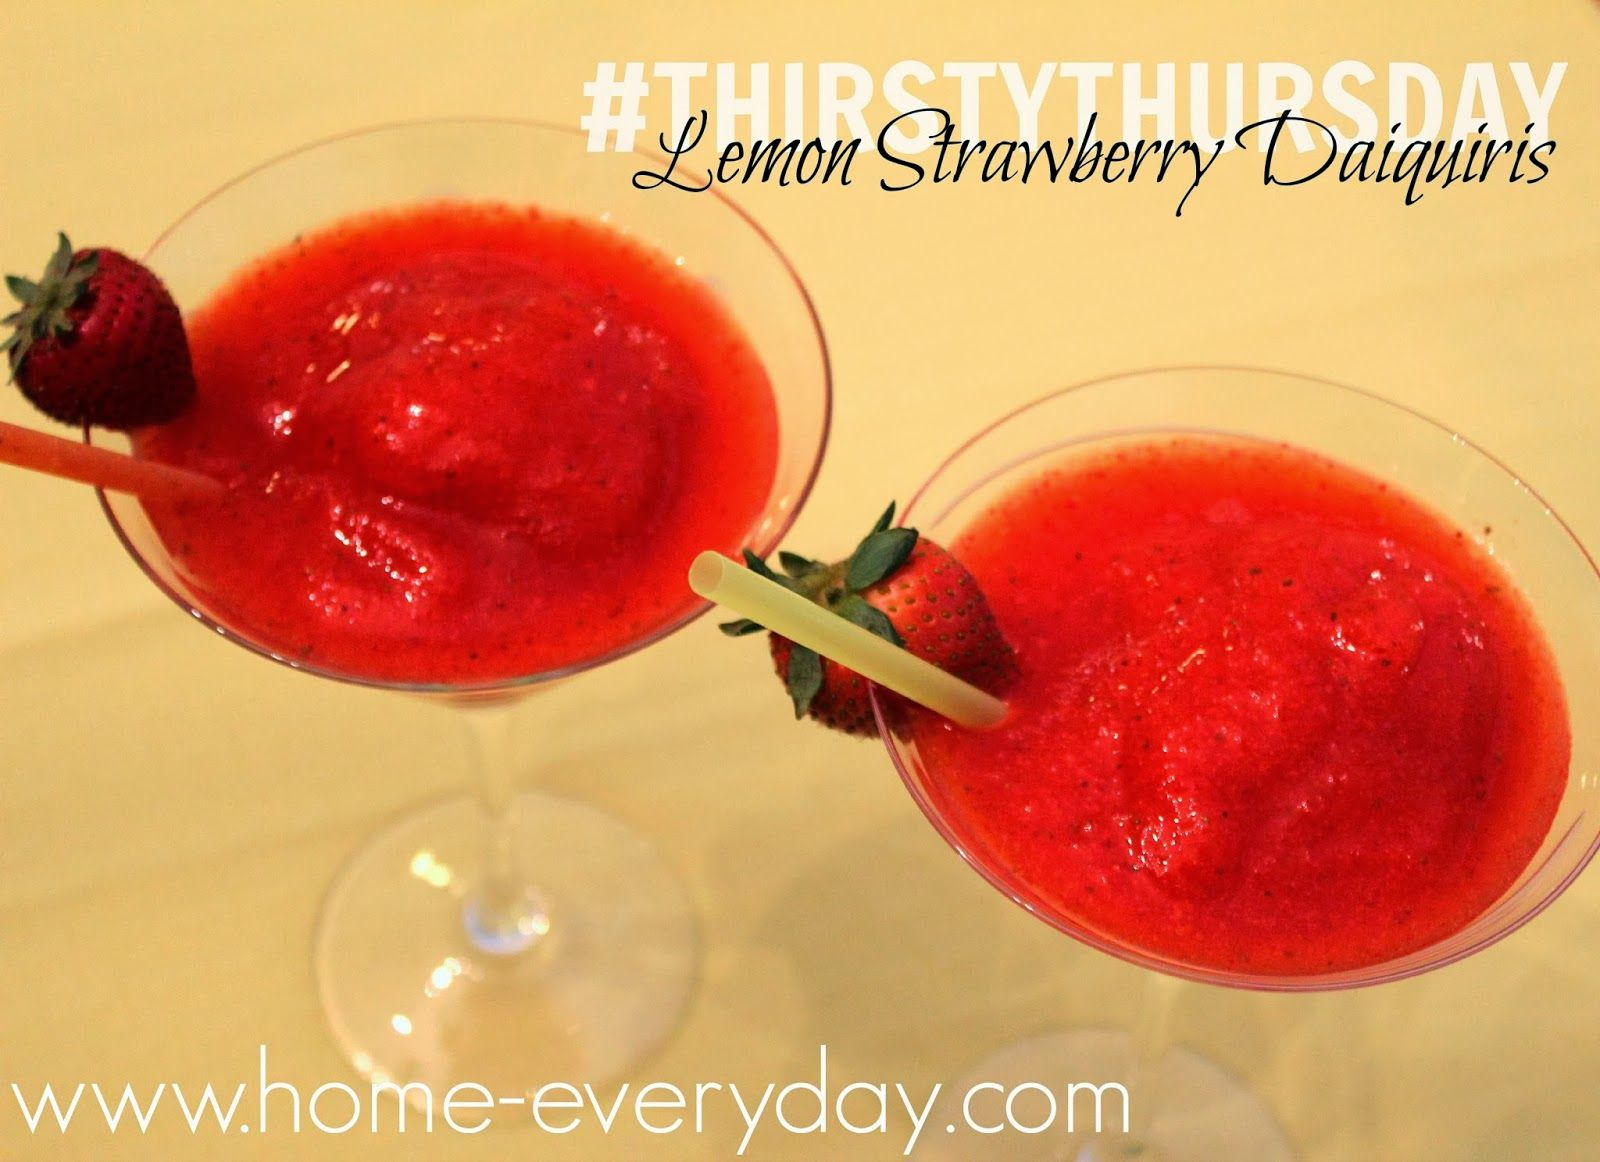 Lemon Strawberry Daiquiris  http://www.home-everyday.com/2014/01/thirsty-thursday-lemon-strawberry.html